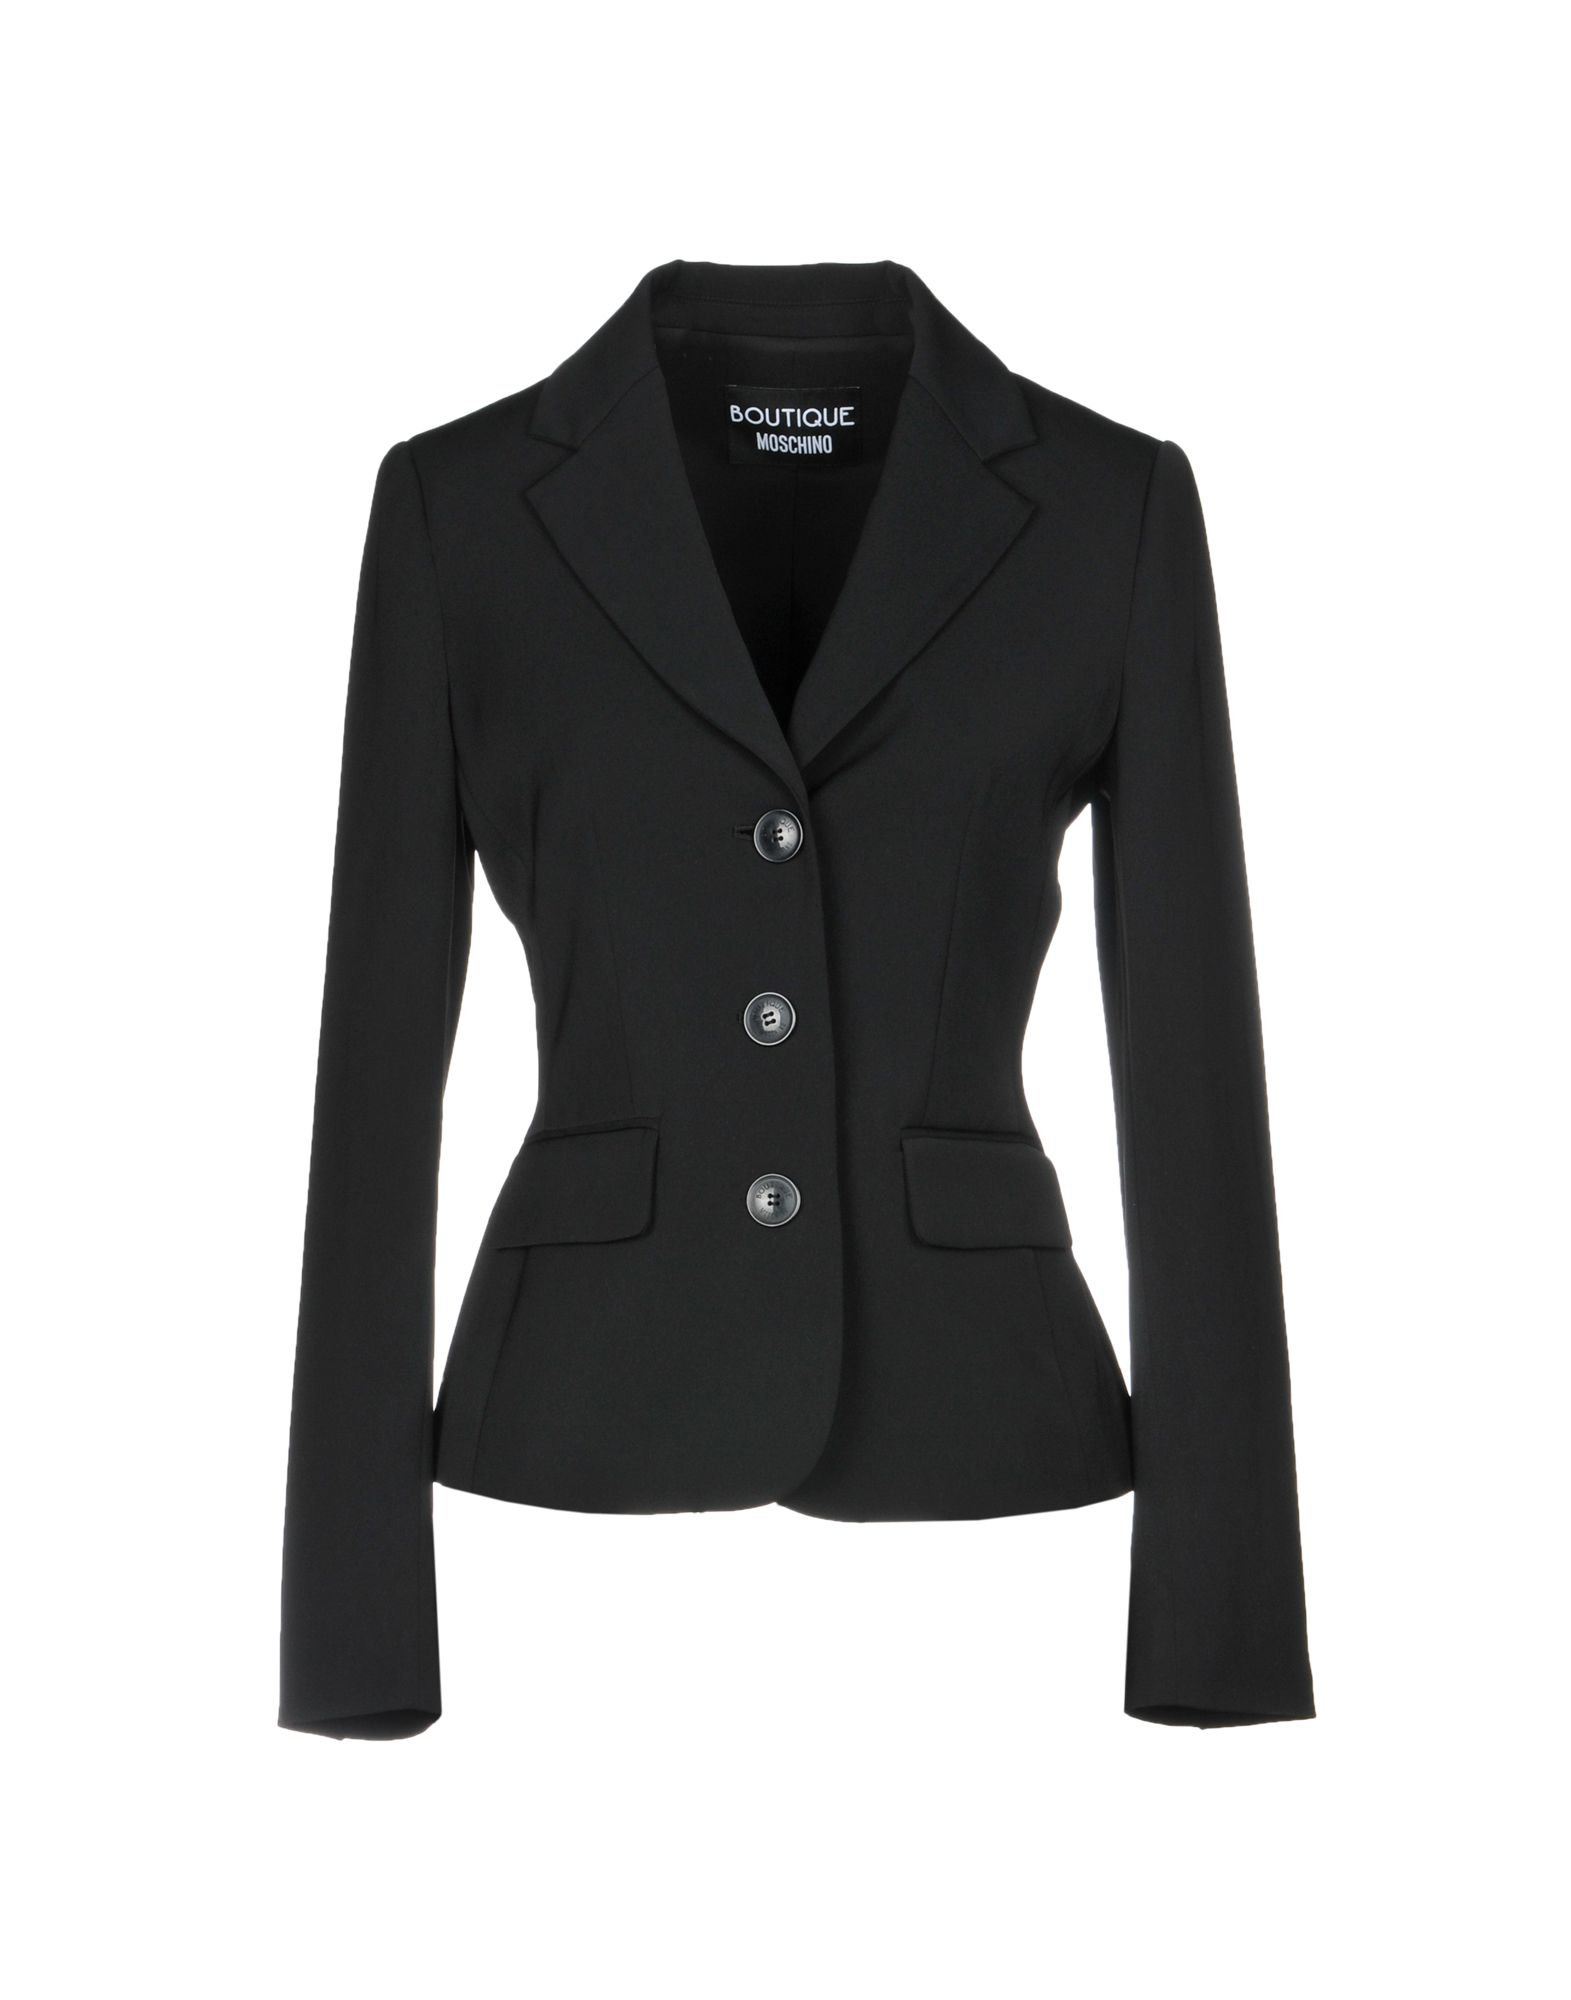 BOUTIQUE MOSCHINO Пиджак пиджак moschino пиджак